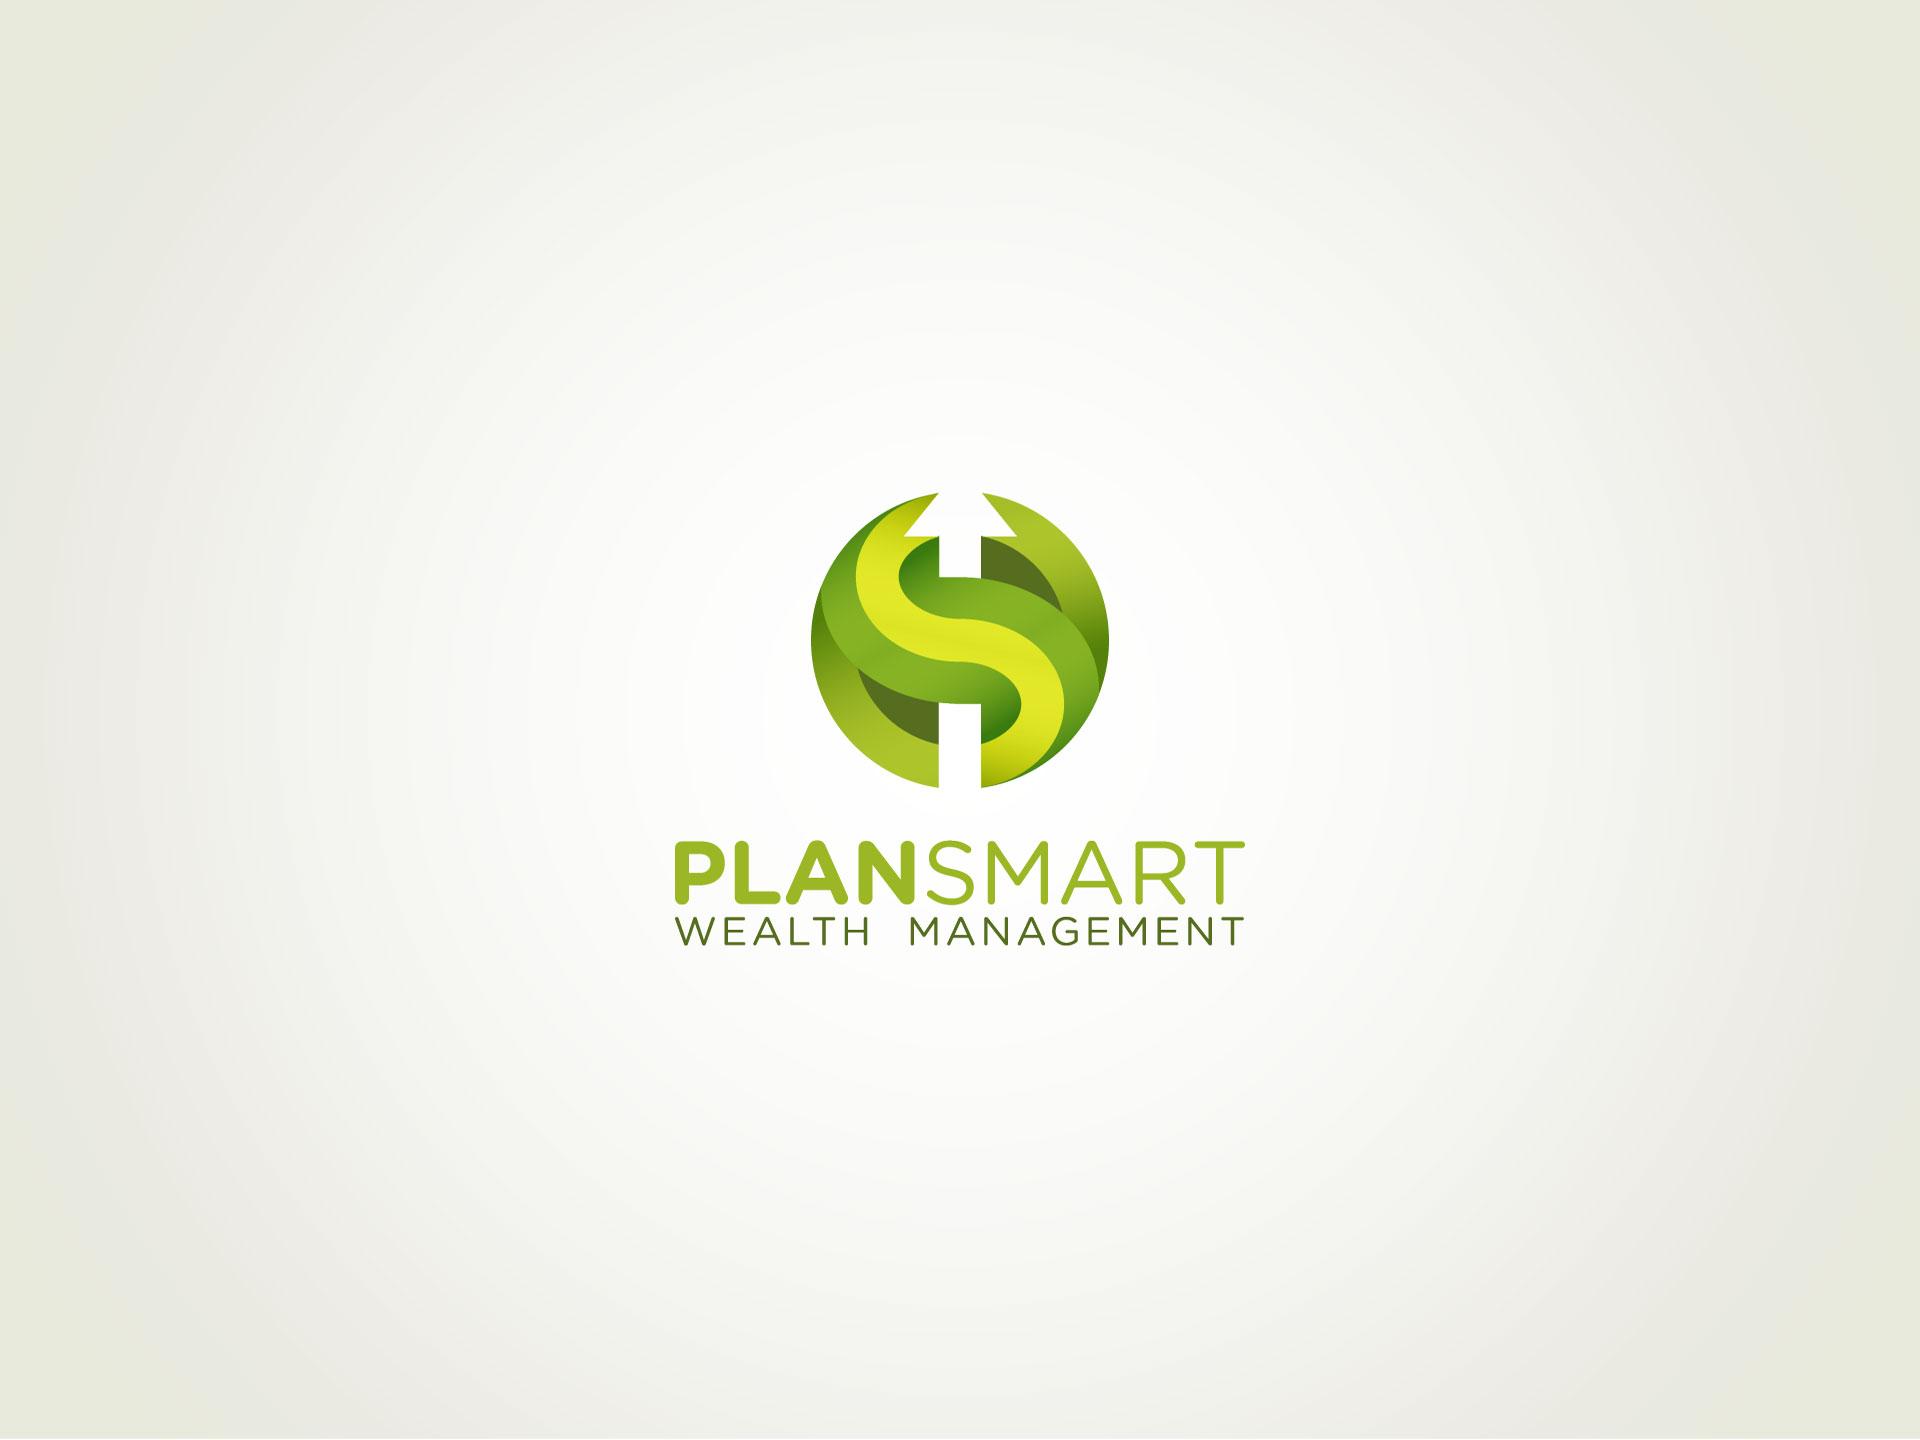 financial planning company branding by Z Creative Studio Branding & Graphic Design Melbourne